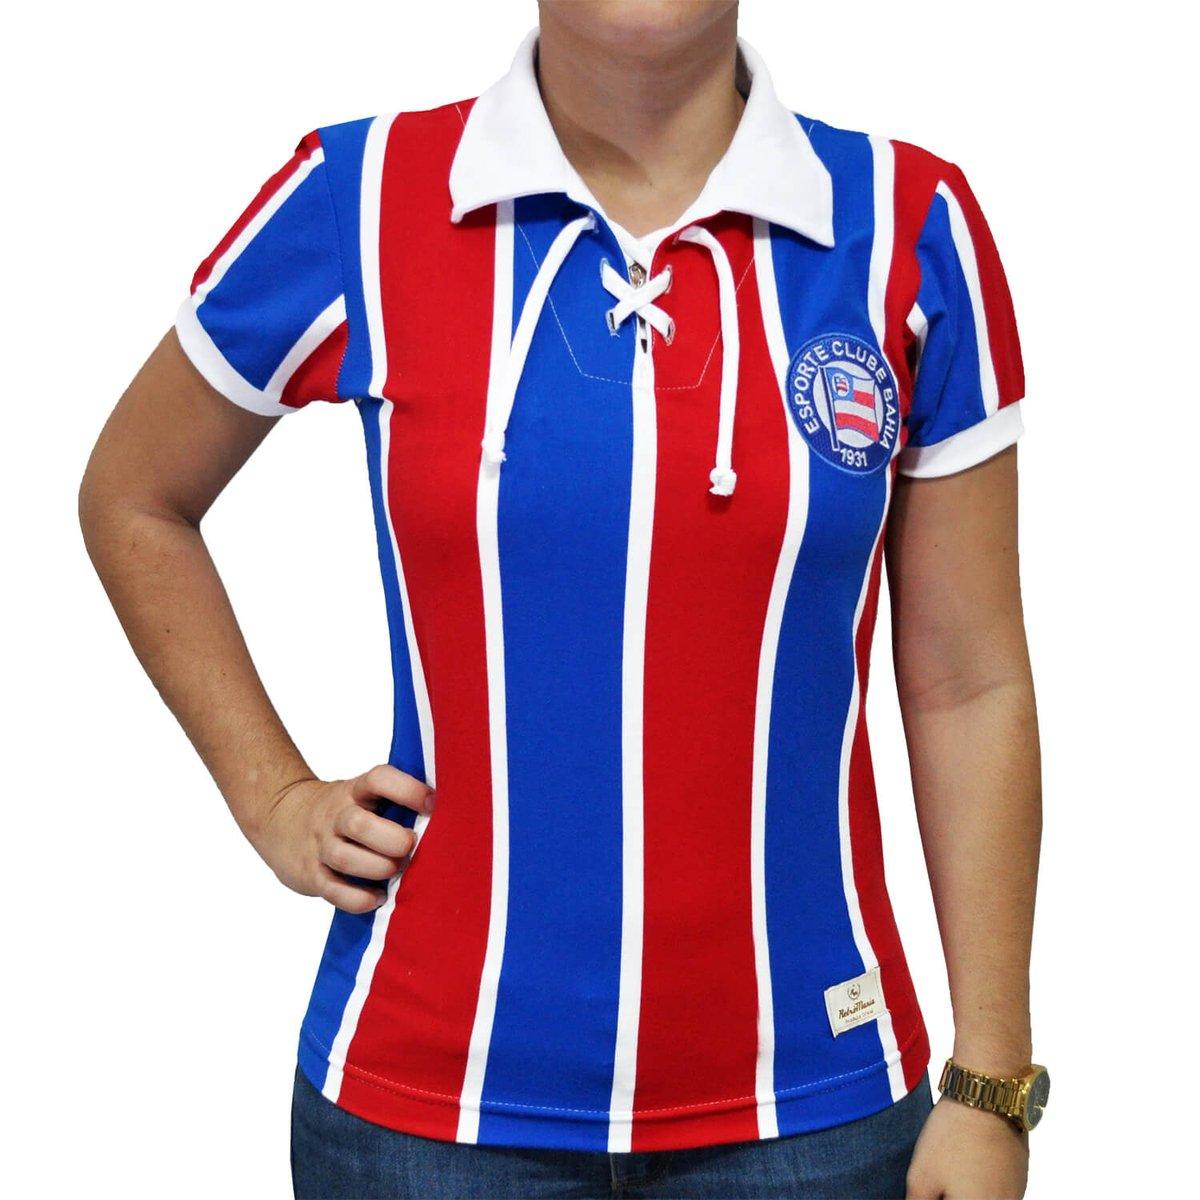 e Mania Azul Camisa Feminina Retrô Vermelho Bahia EC Cordinha gawAq7n1Cx